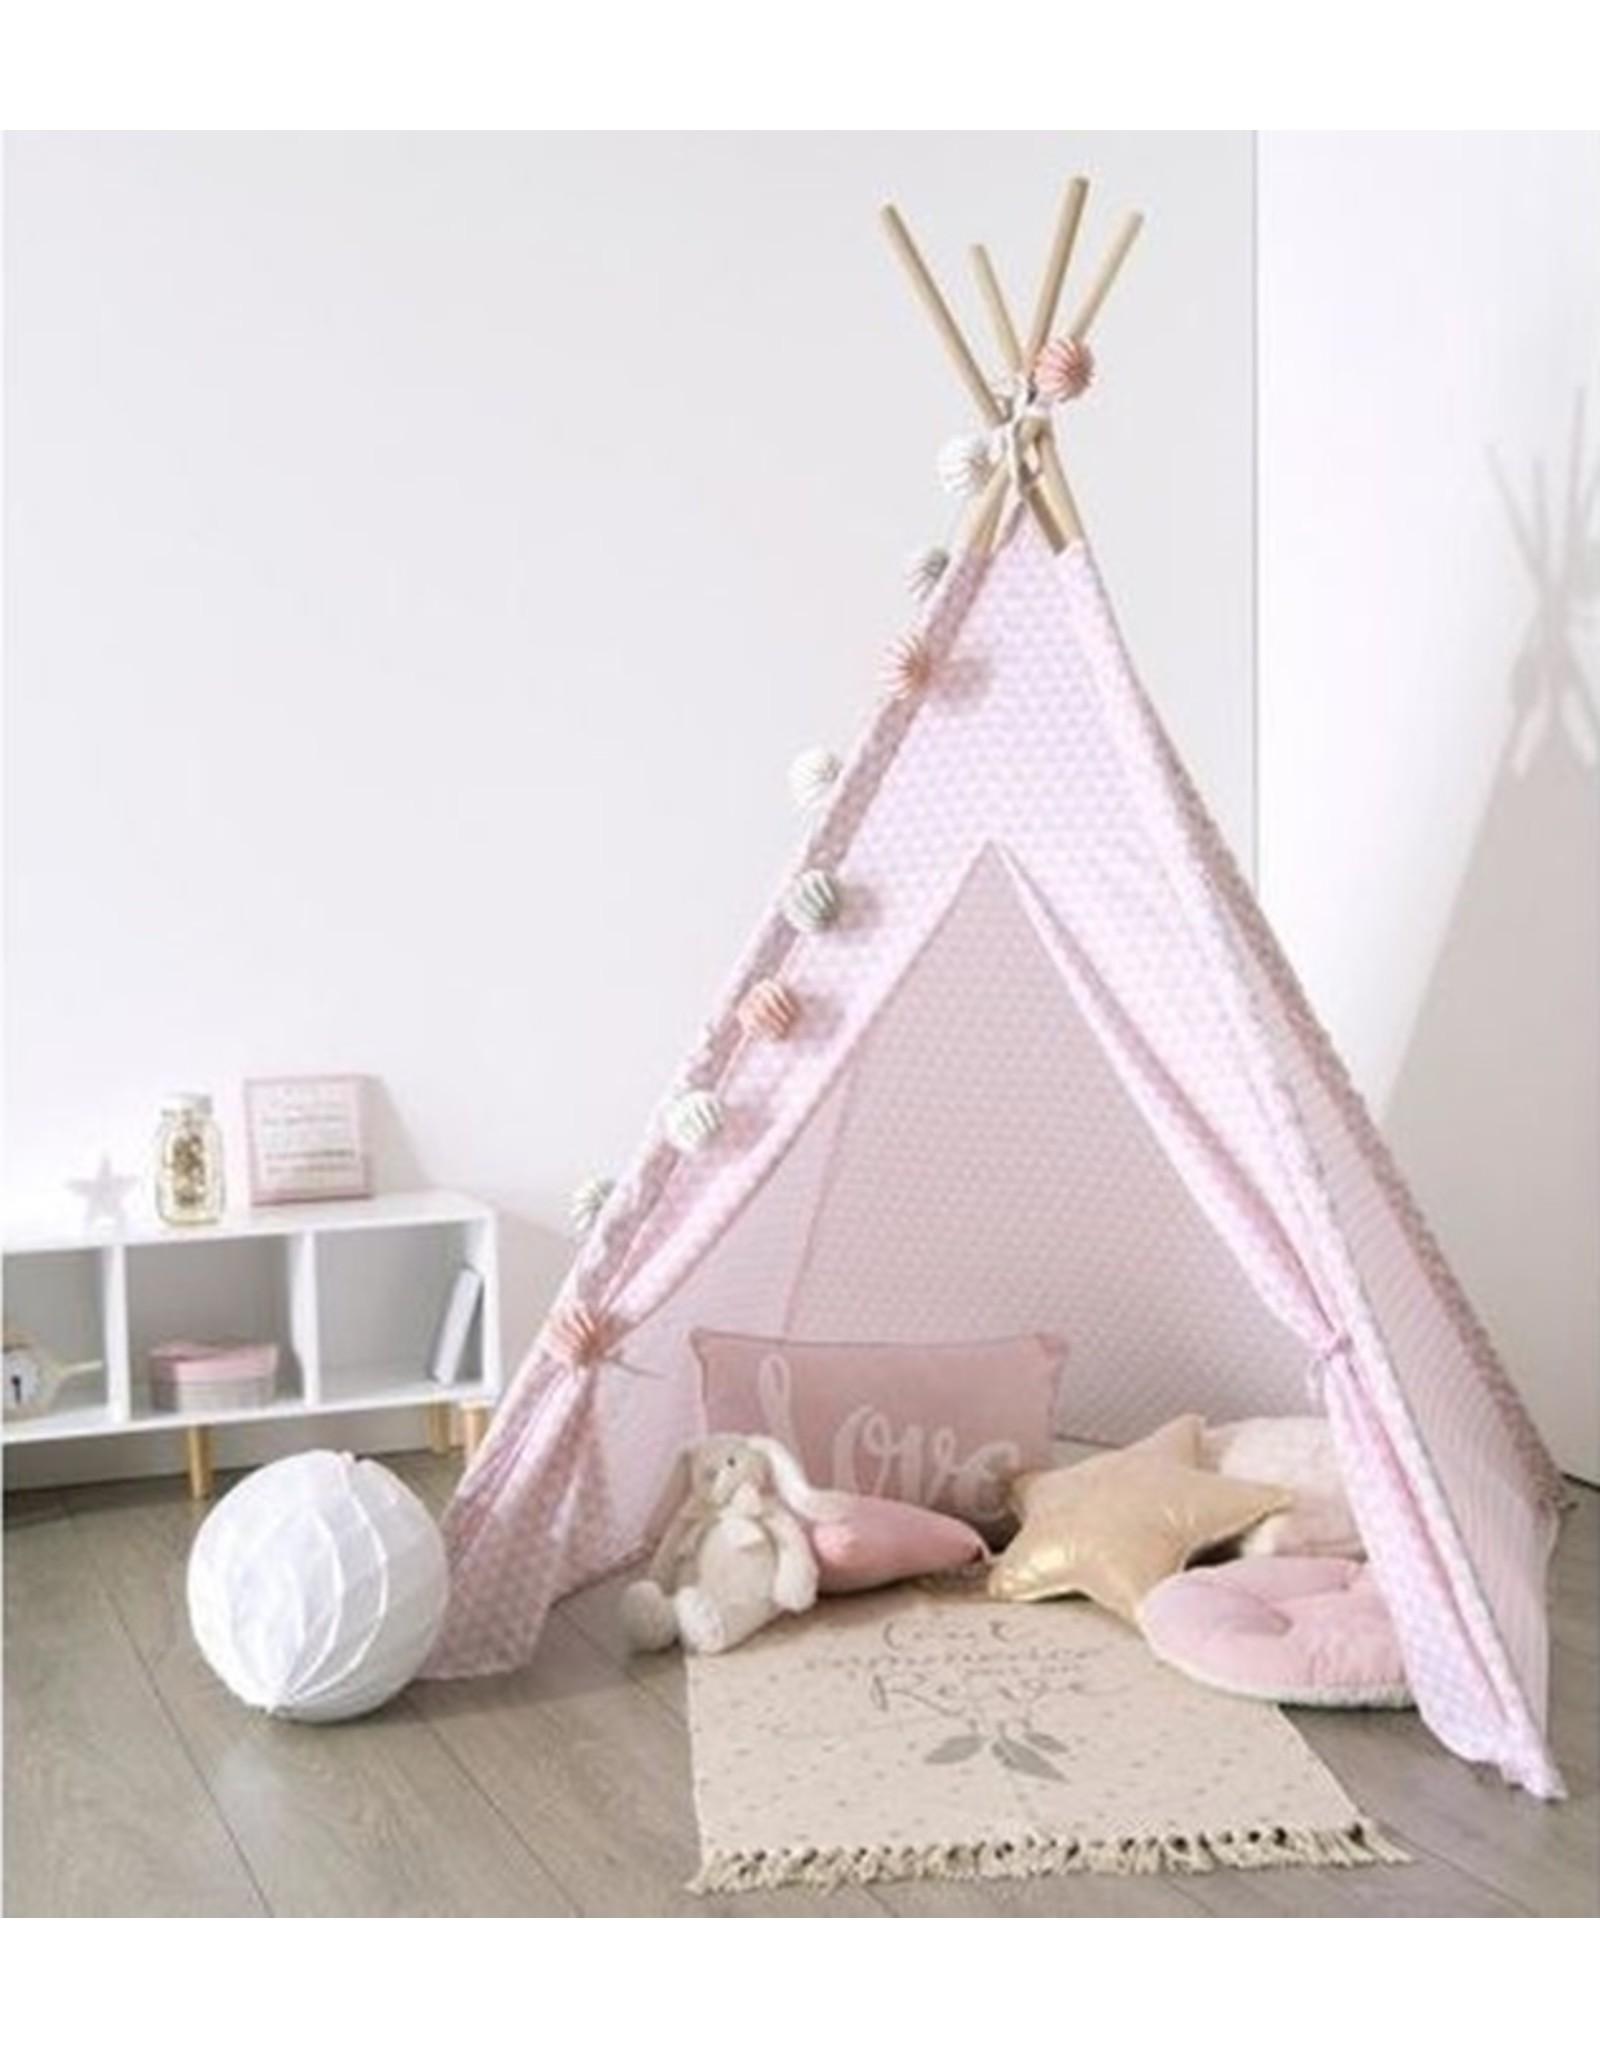 Atmosphera Atmosphera - Kinder Tipi-Tent - Polyester - Speeltent - Roze